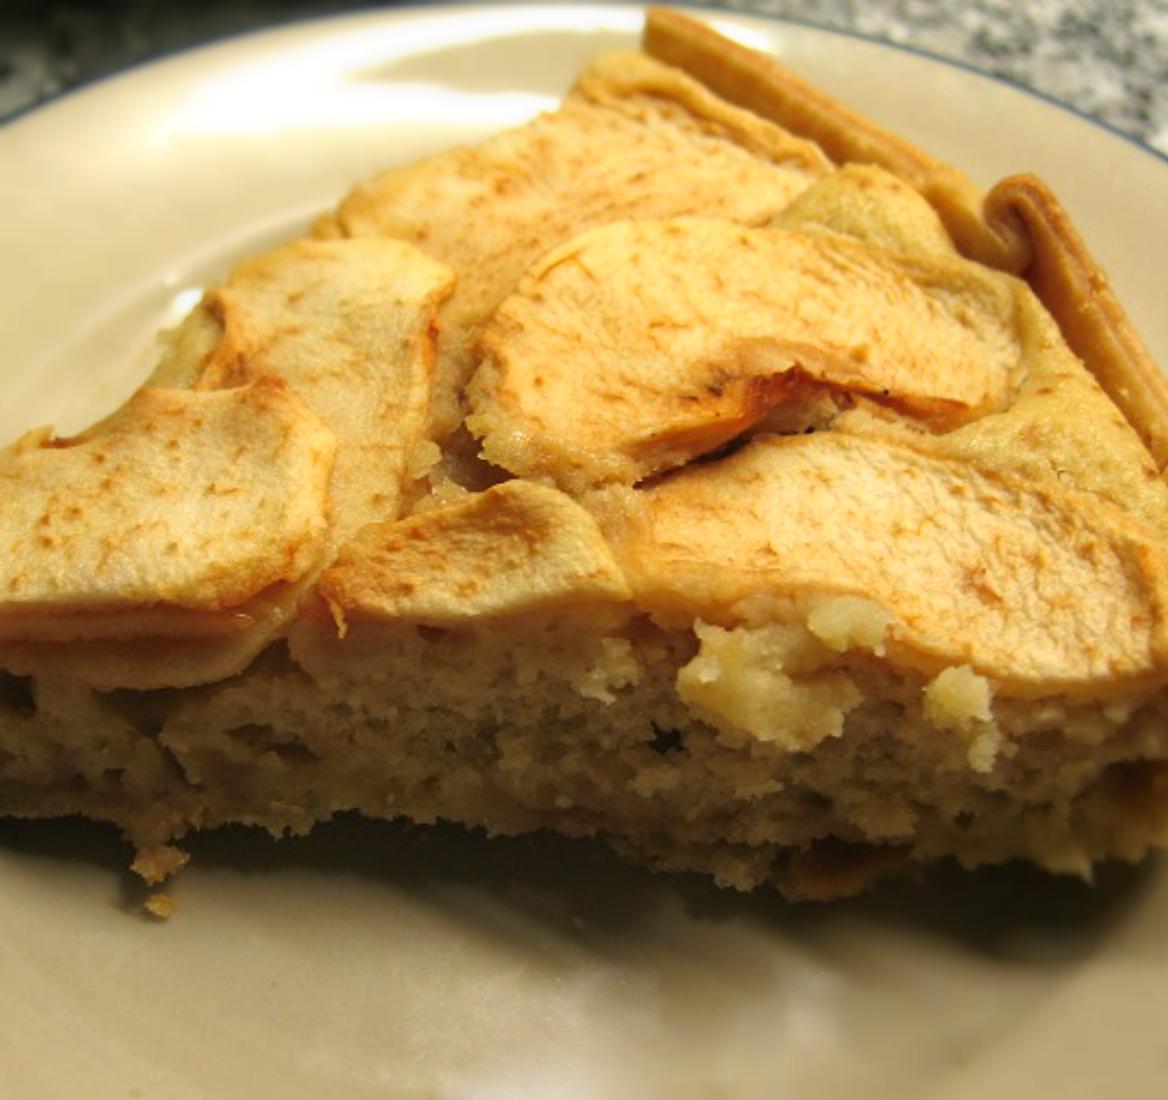 Tarte de maçã reineta / Reinette apple pie